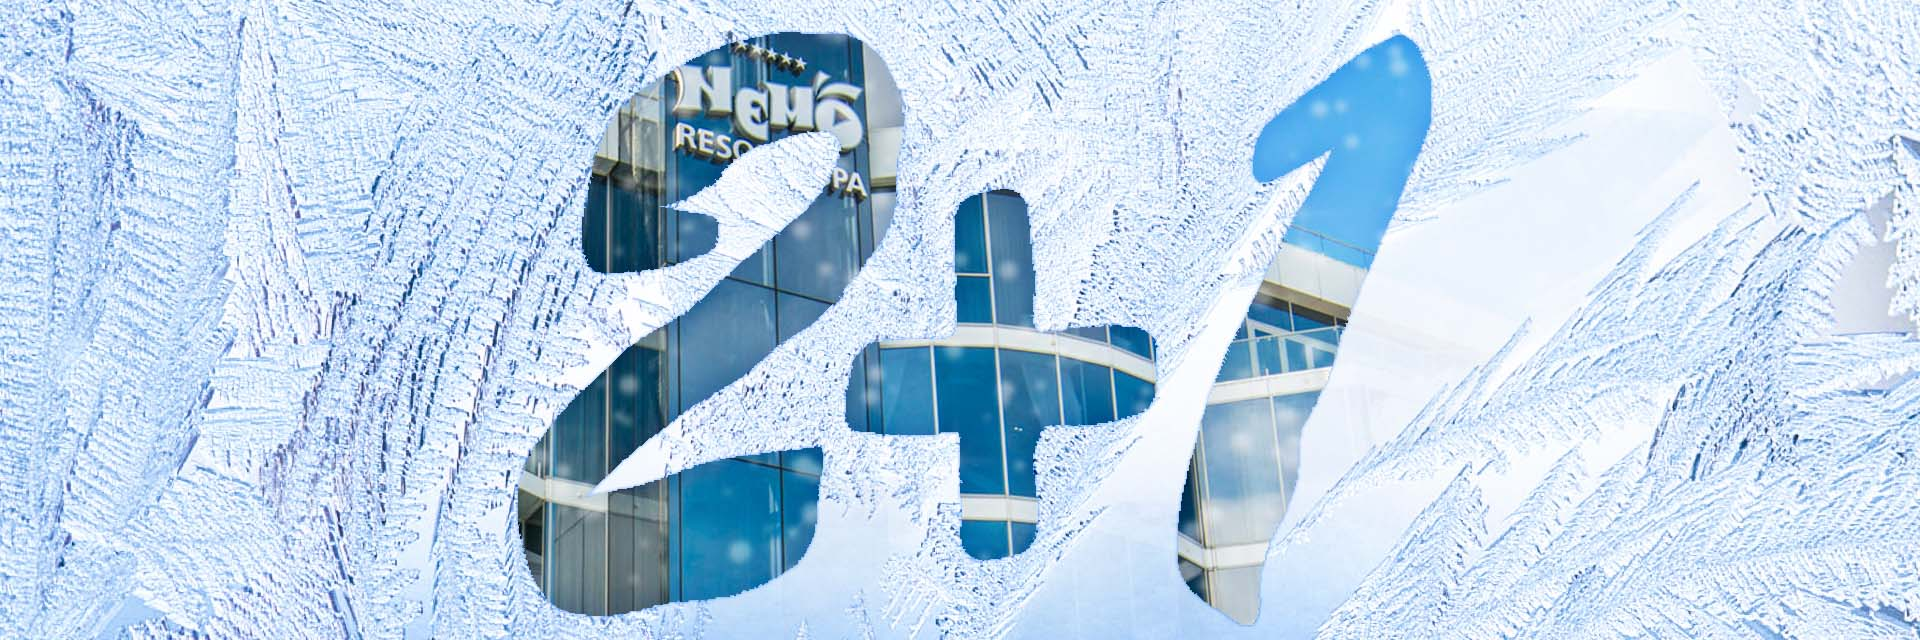 Winter 2+1- Hotel NEMO, Photo № 1